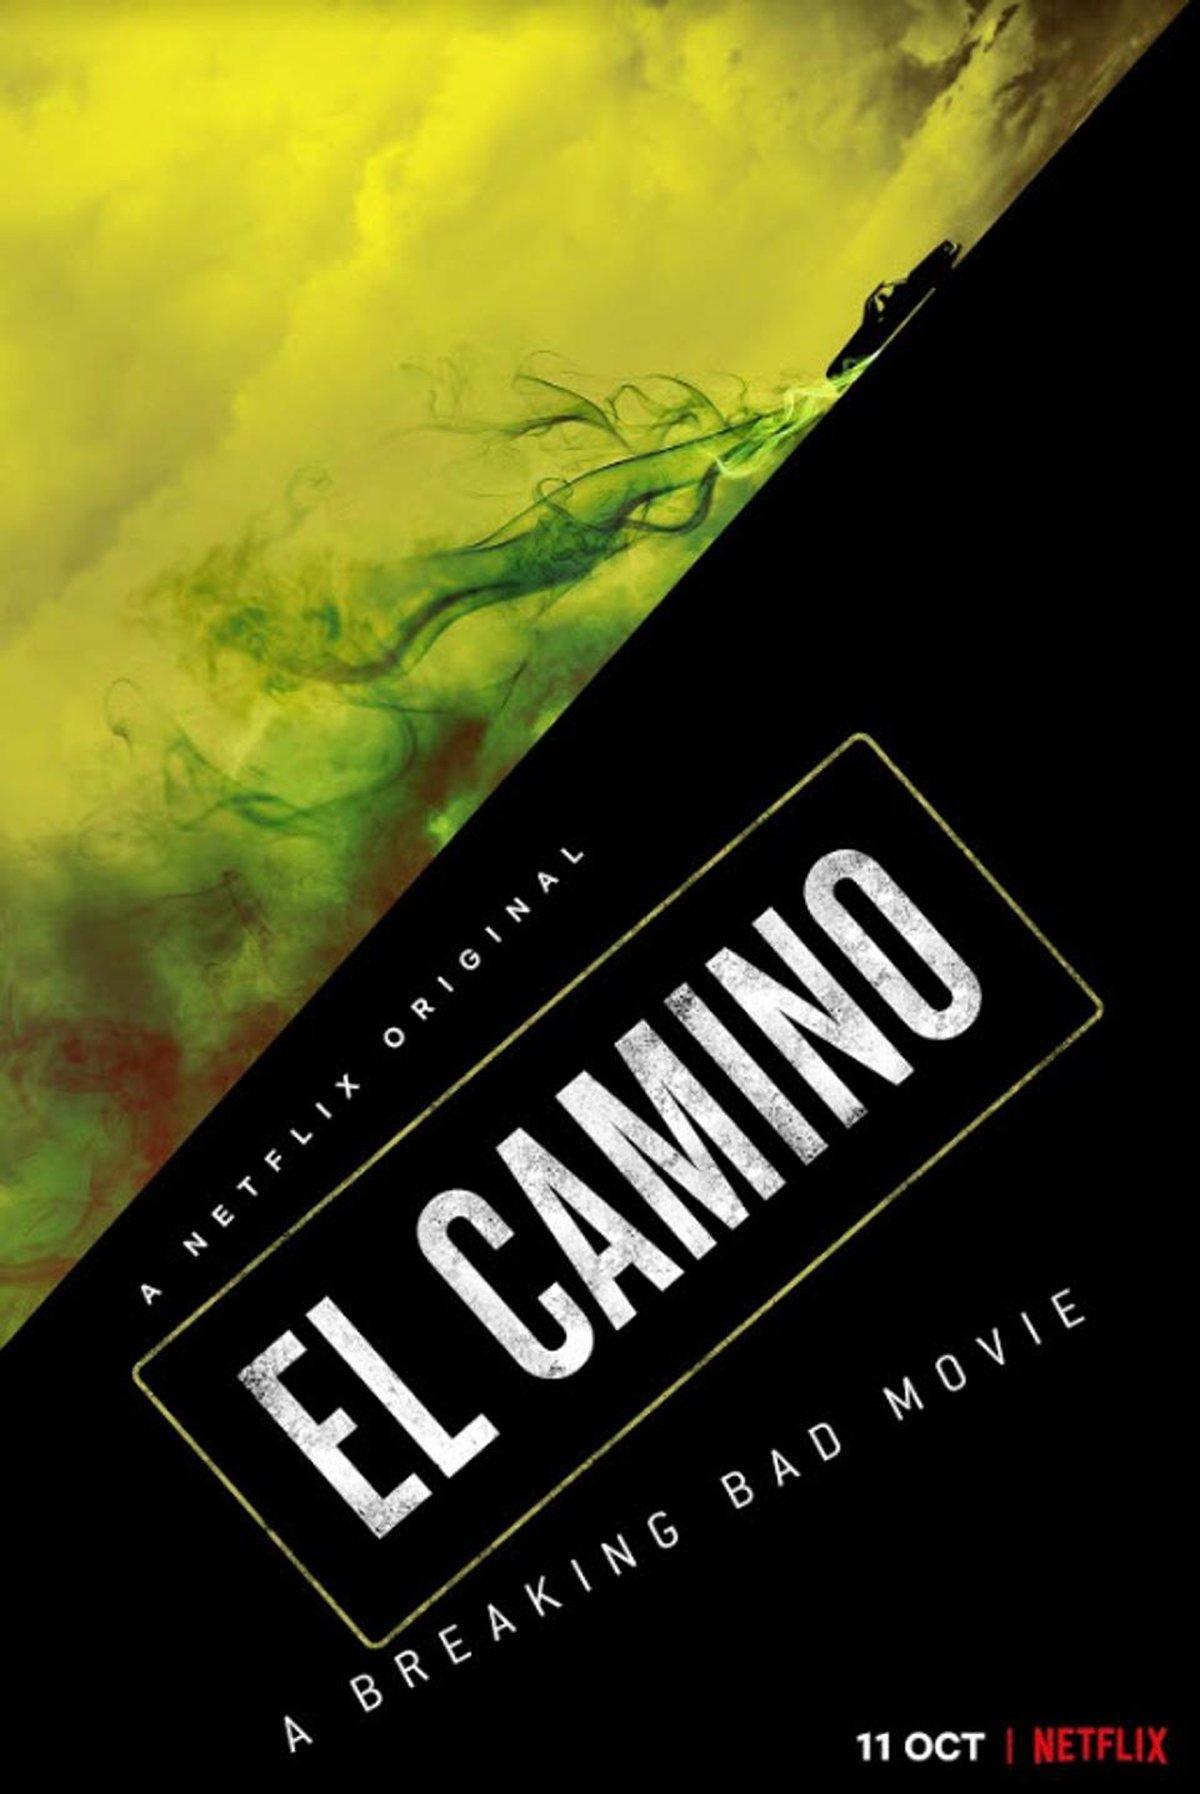 El Camino A Breaking Bad Movie poster Netflix